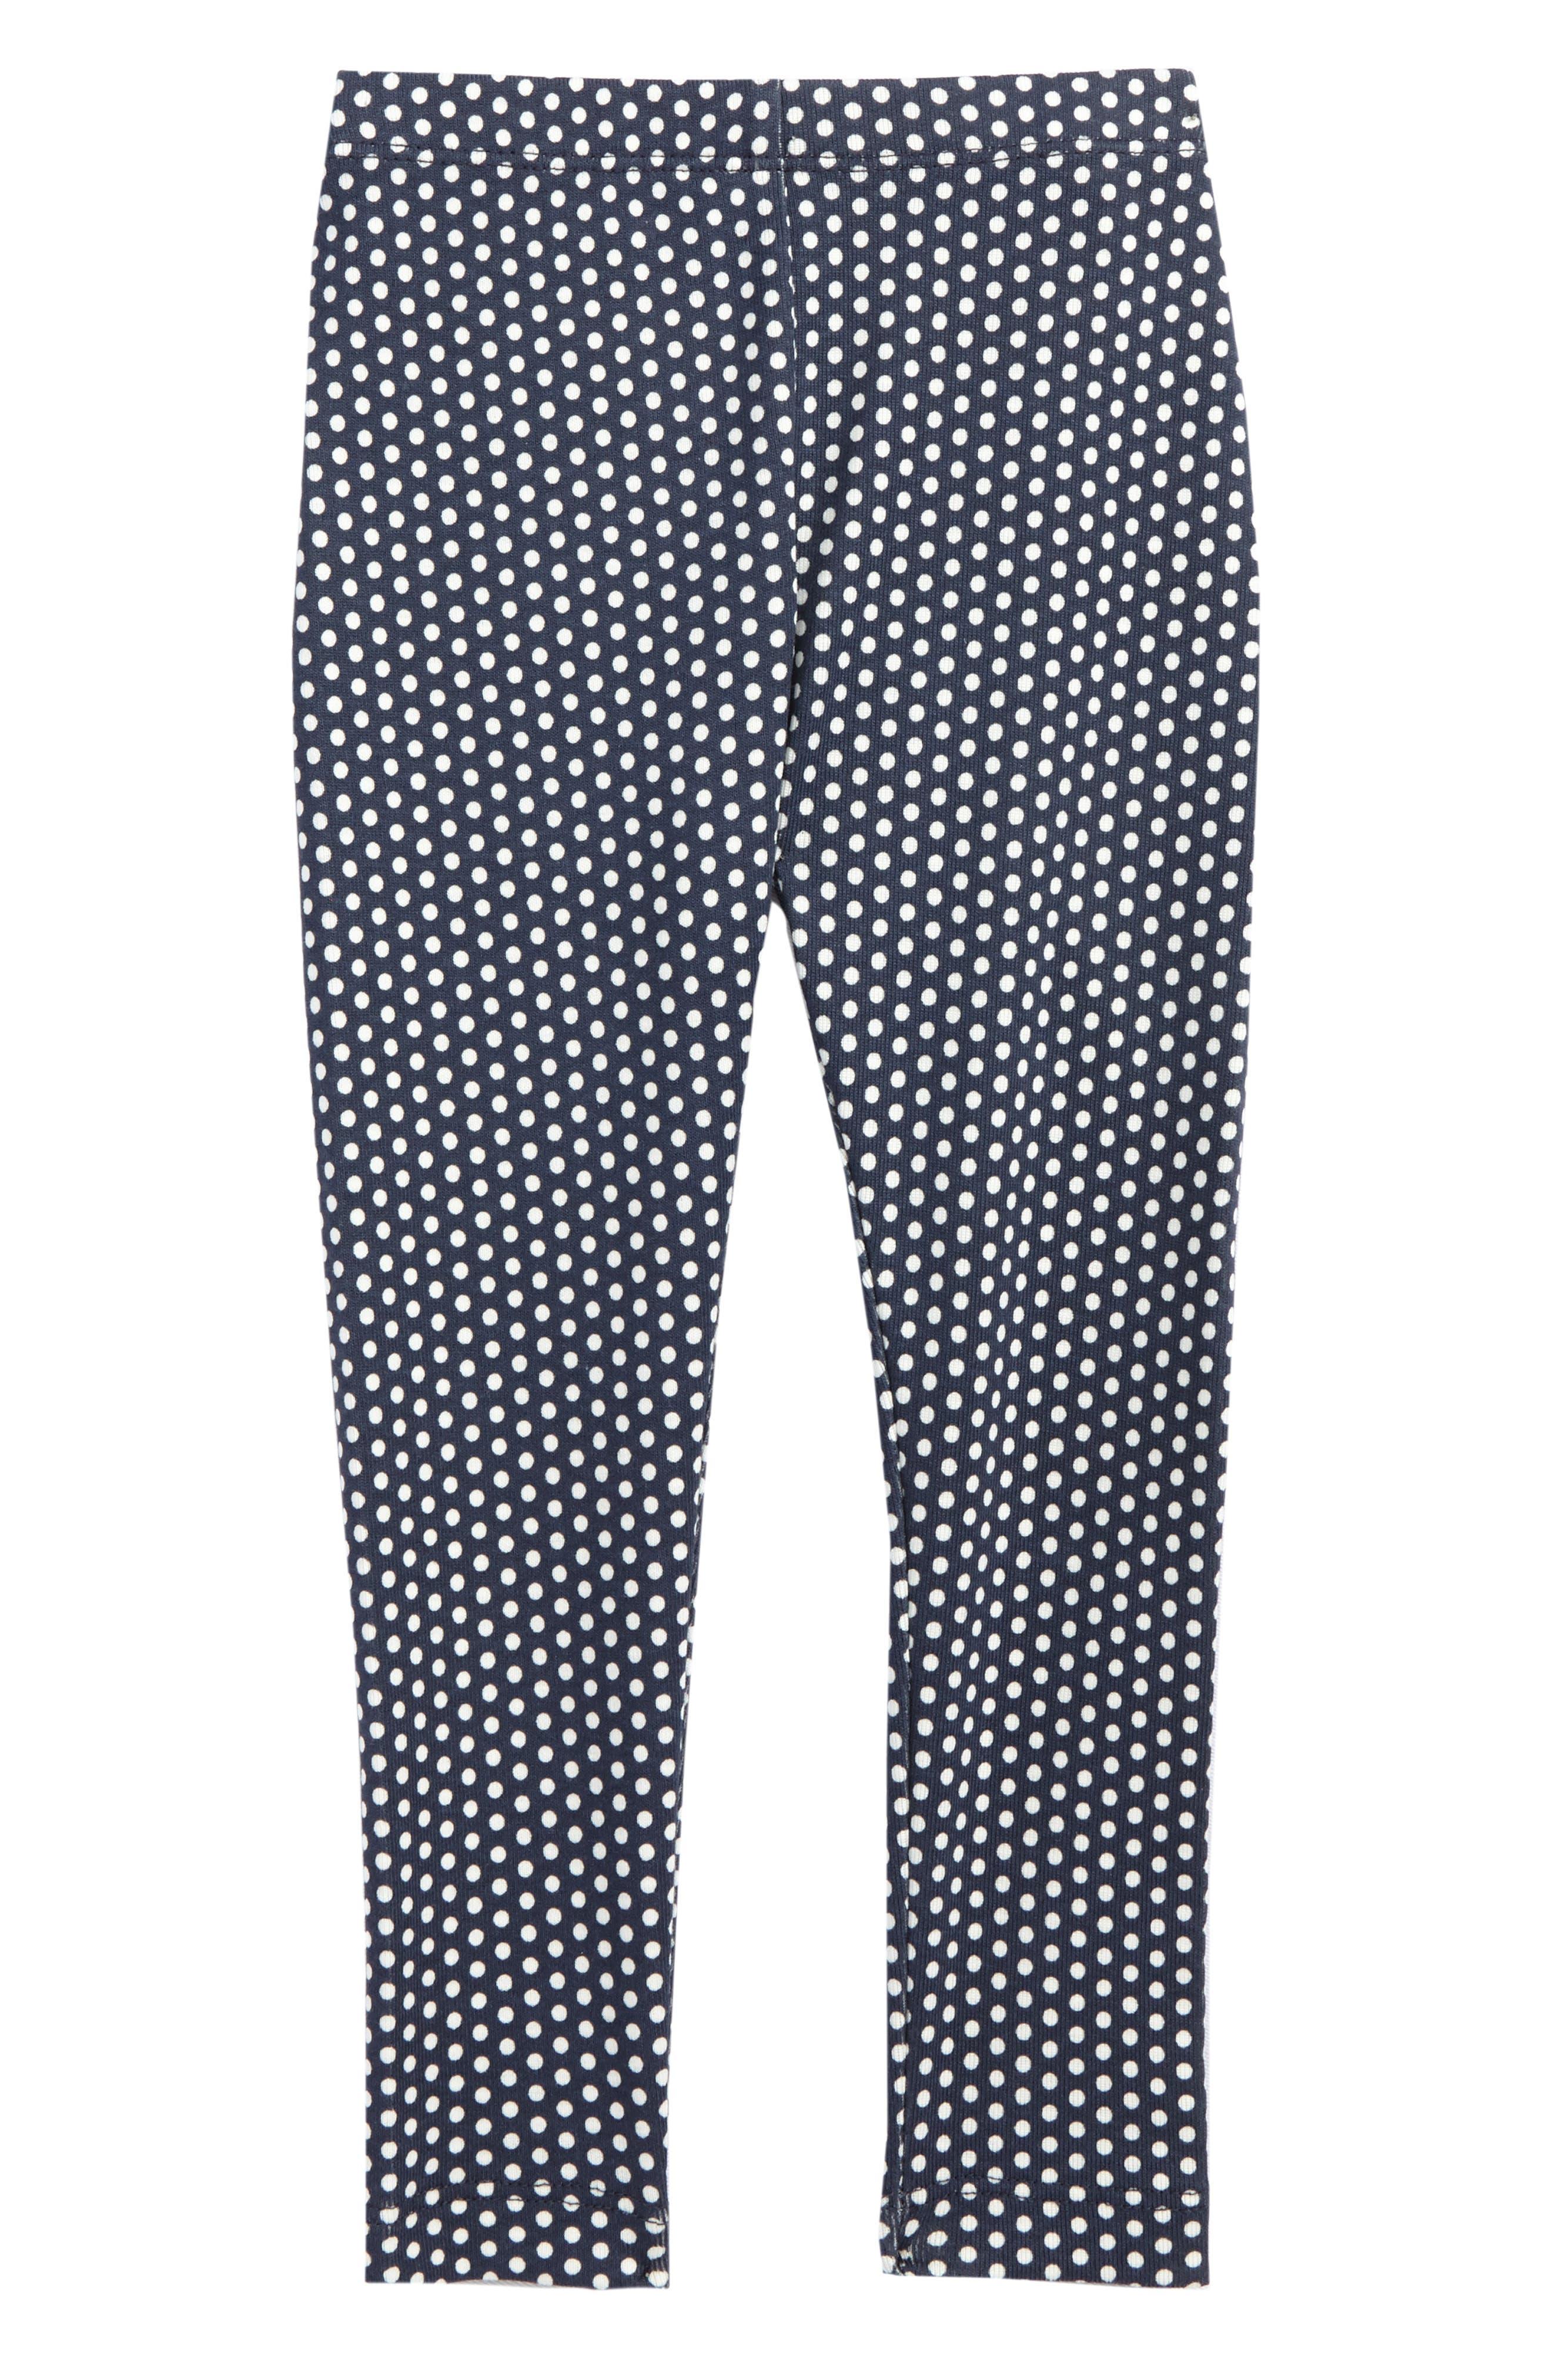 Main Image - Tea Collection Polka Dot Leggings (Baby Girls)